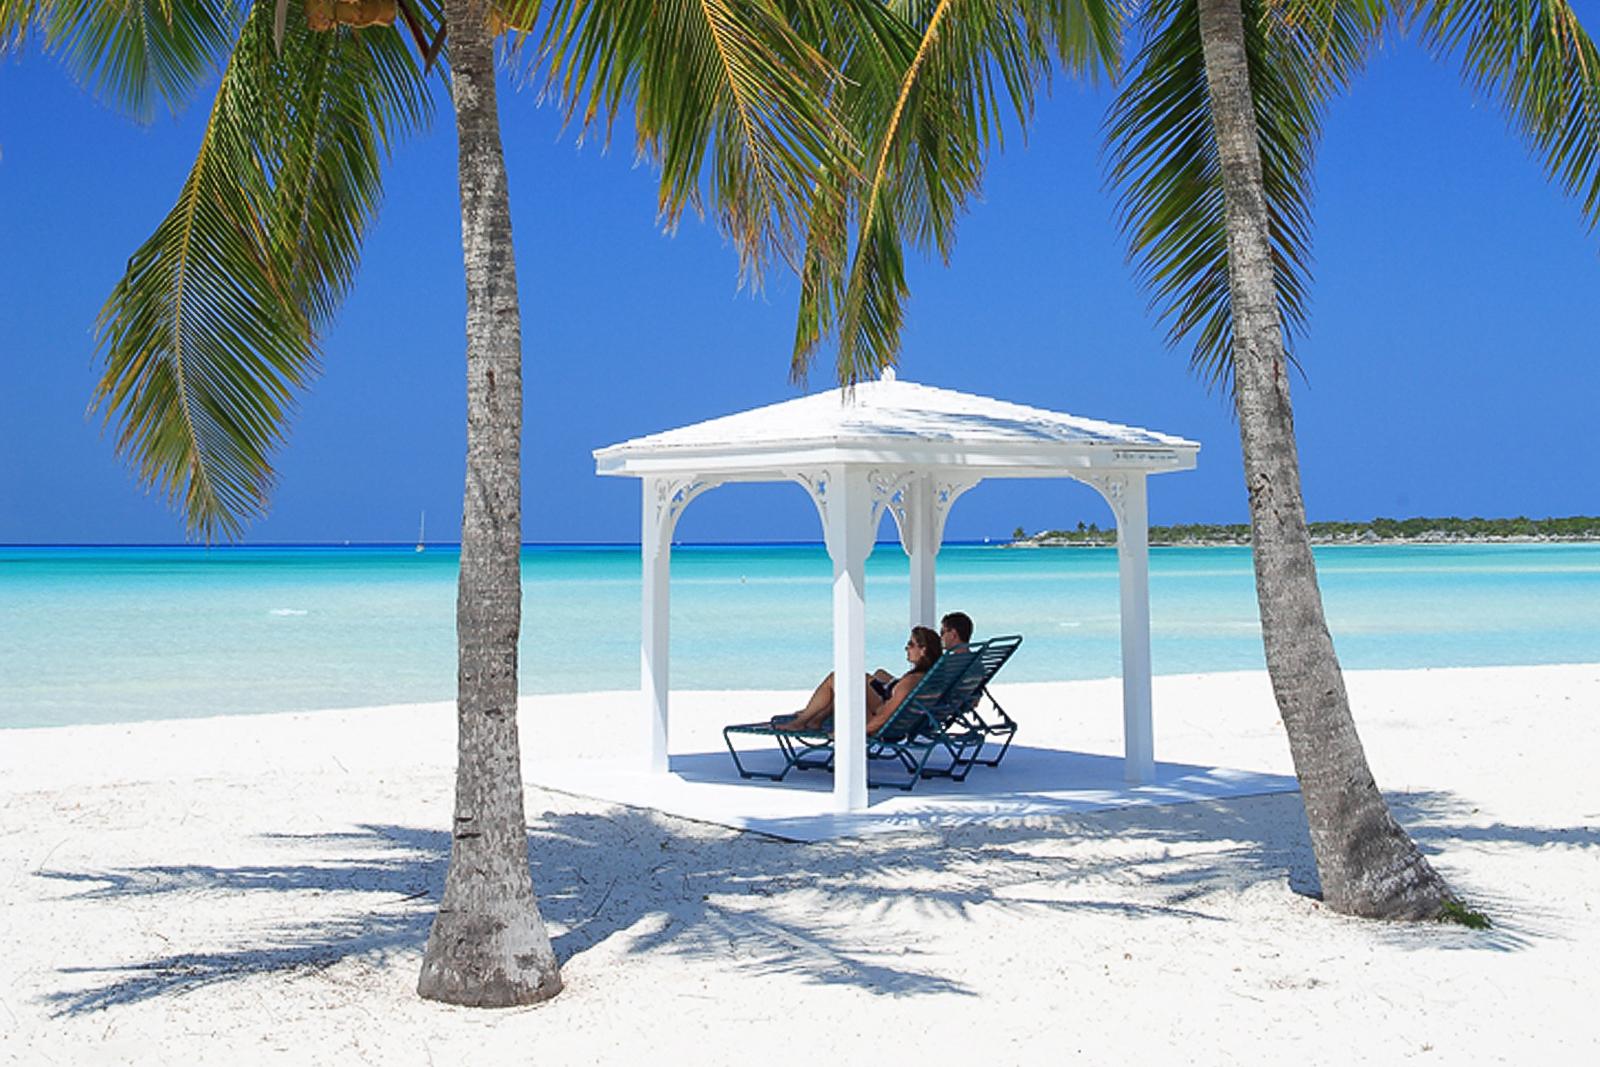 Cape Santa Maria Beach Resort Long Island Bahamas Ministry Of Tourism